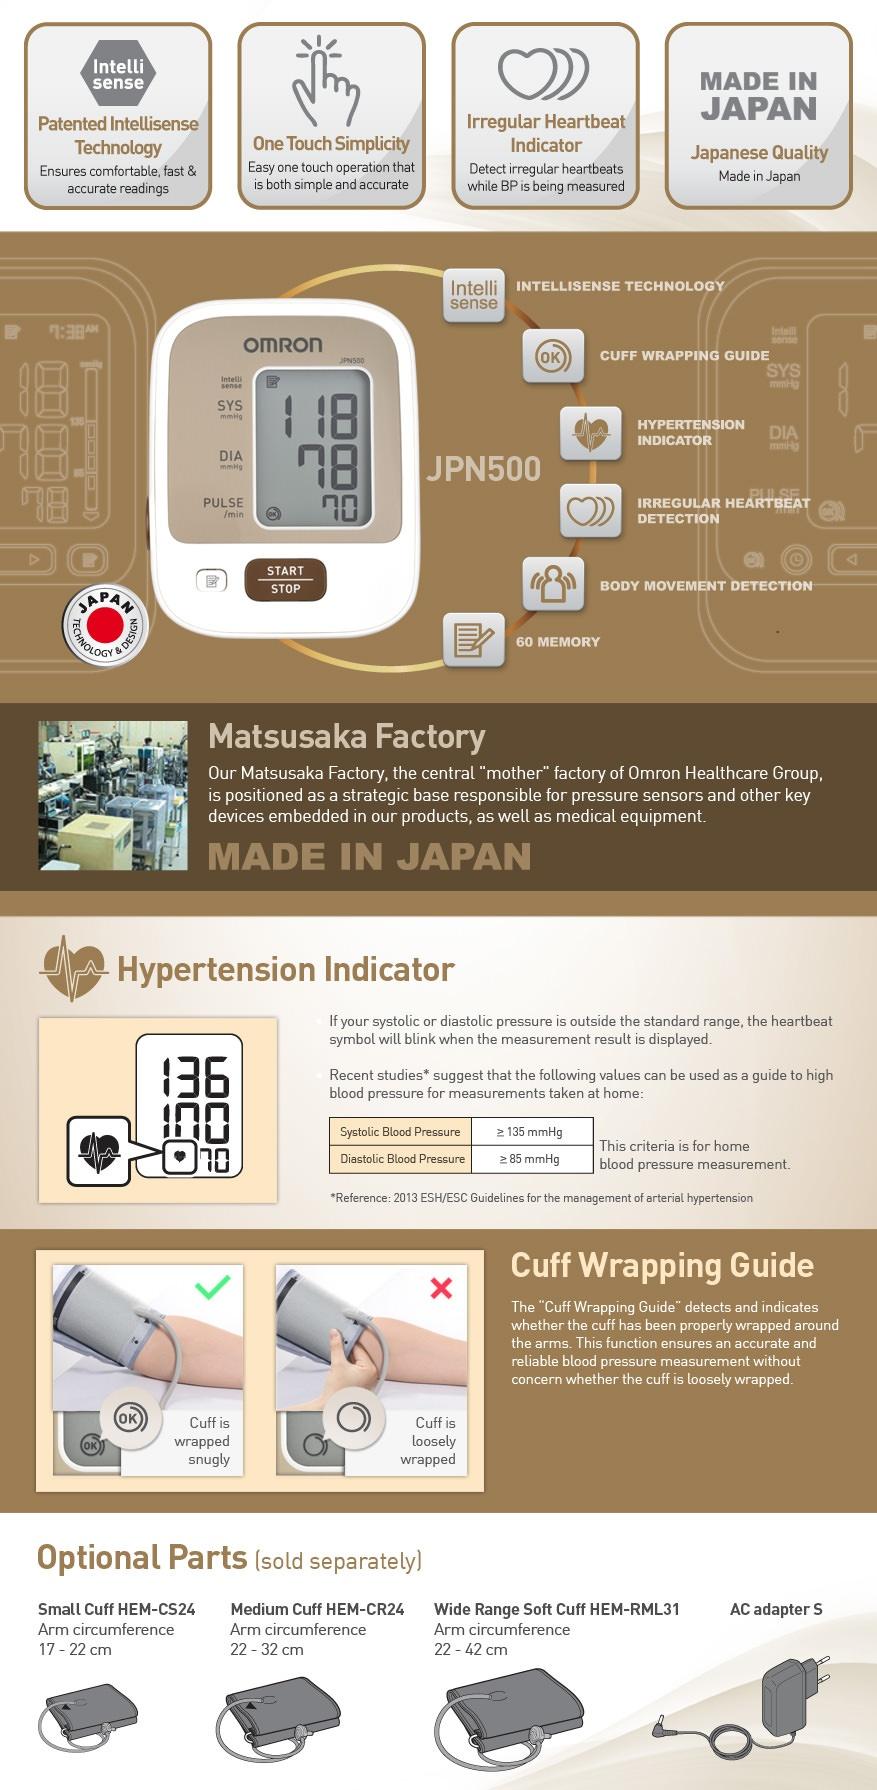 Omron JPN500 Automatic Blood Pressure Monitor Japan